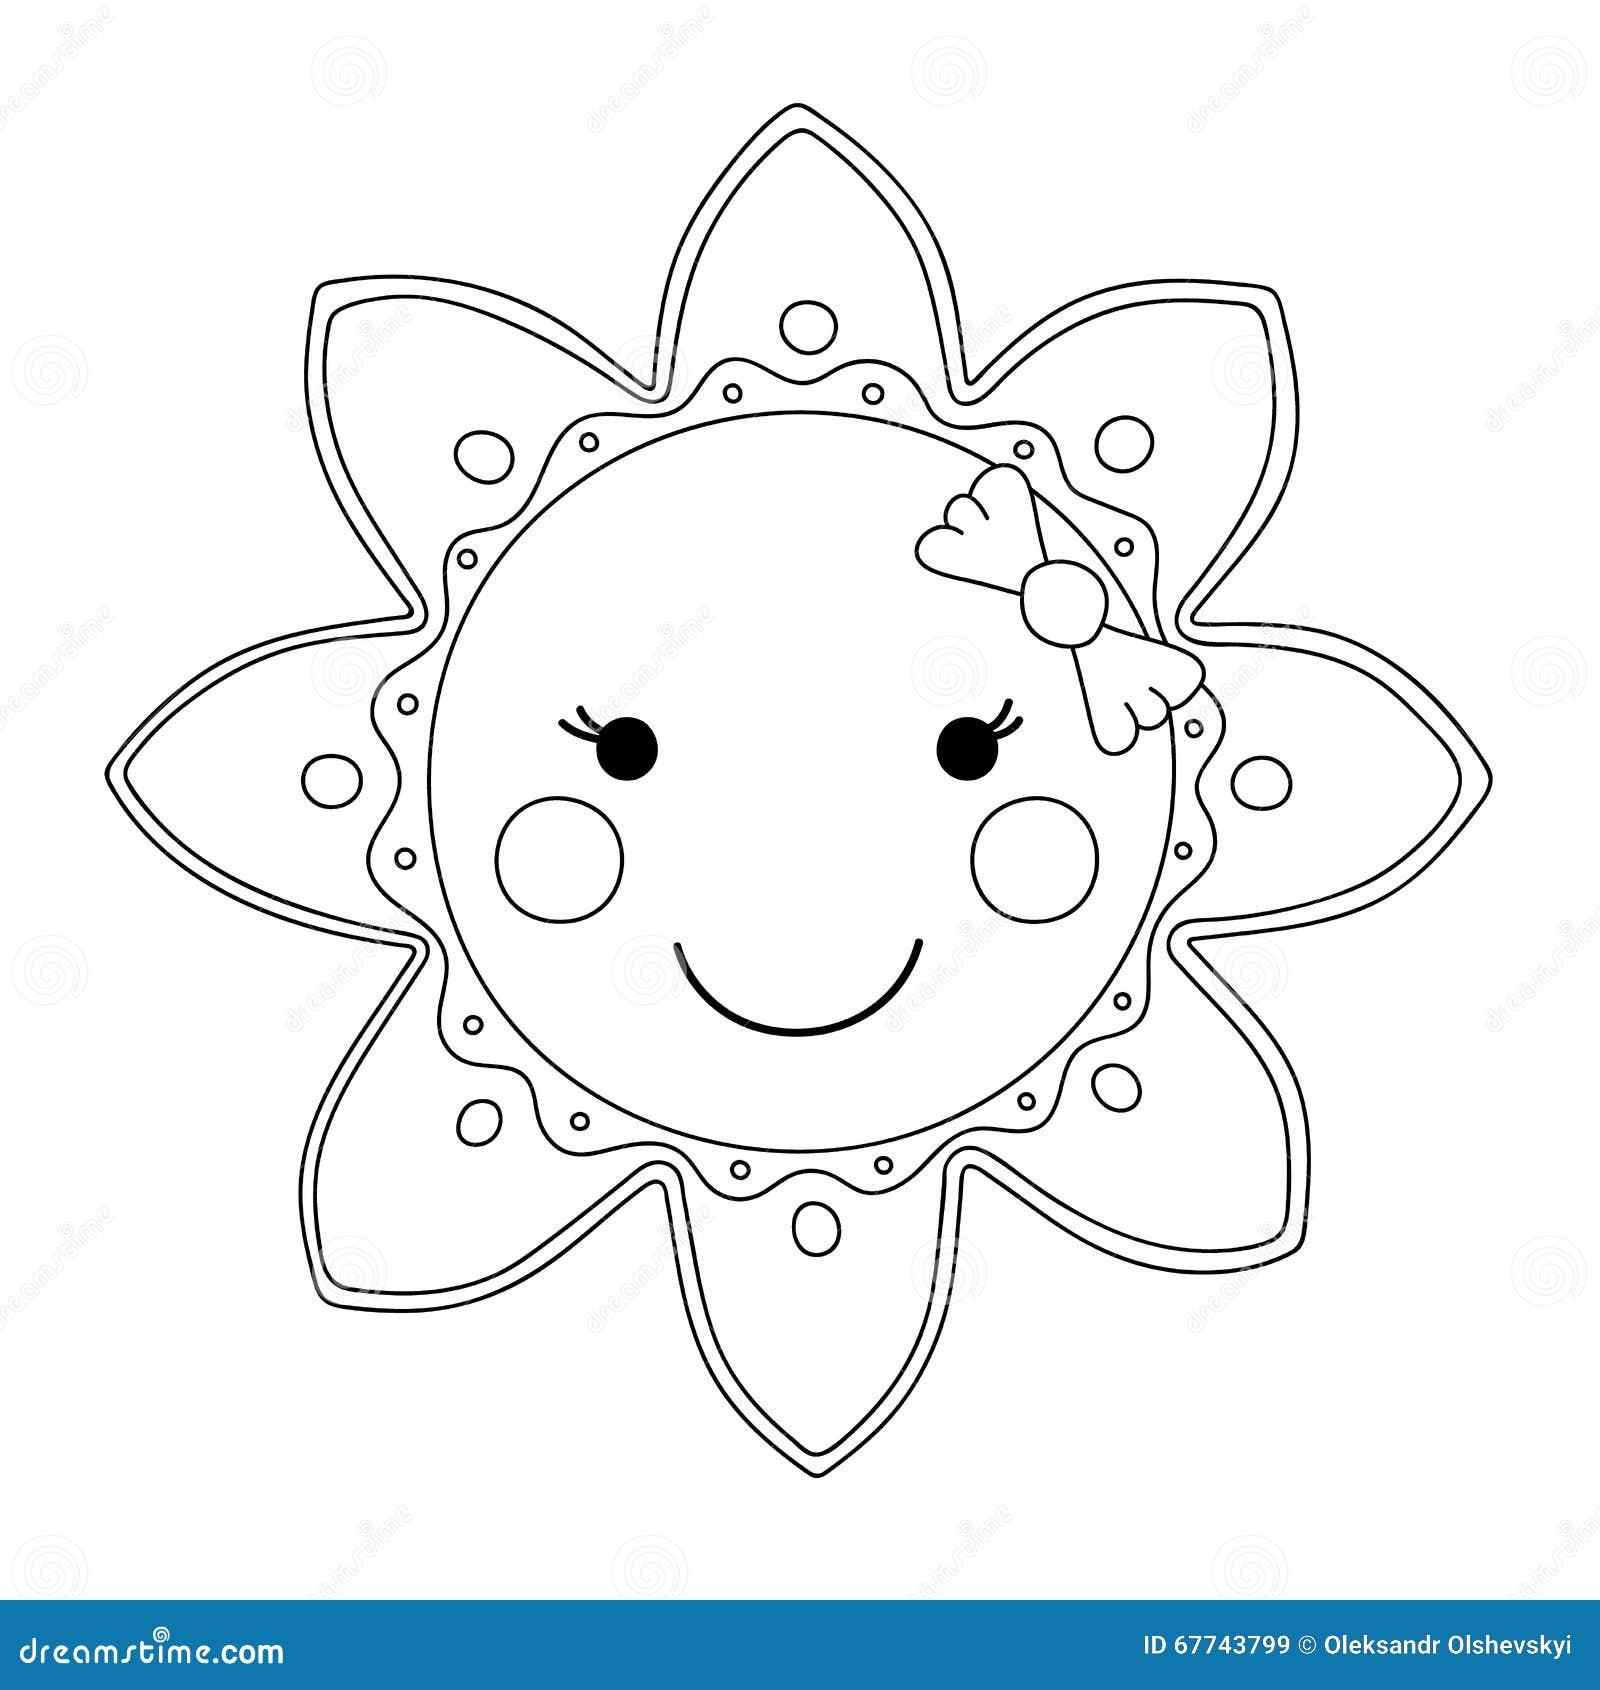 солнце картинка черно белая